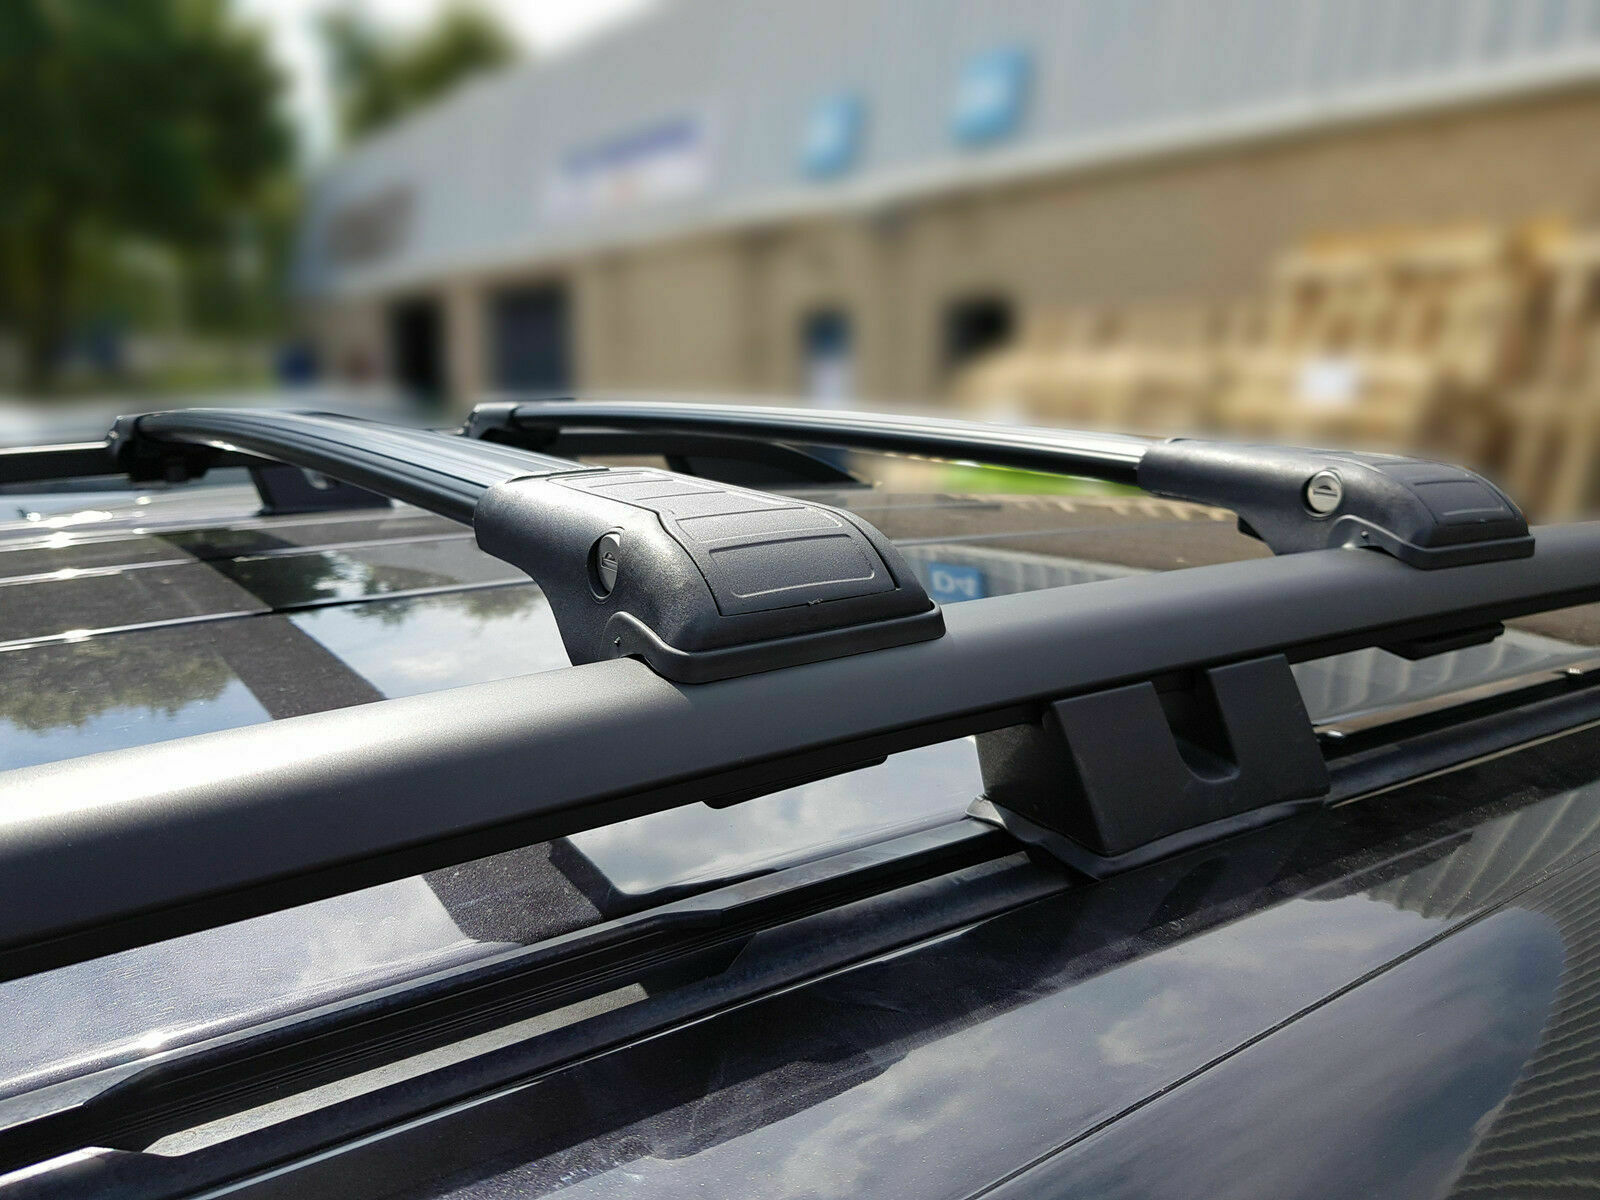 VW TIGUAN LOCKABLE CROSS BAR ROOF BARS RACK 75 KG LOADING CAPACITY 2007-2015